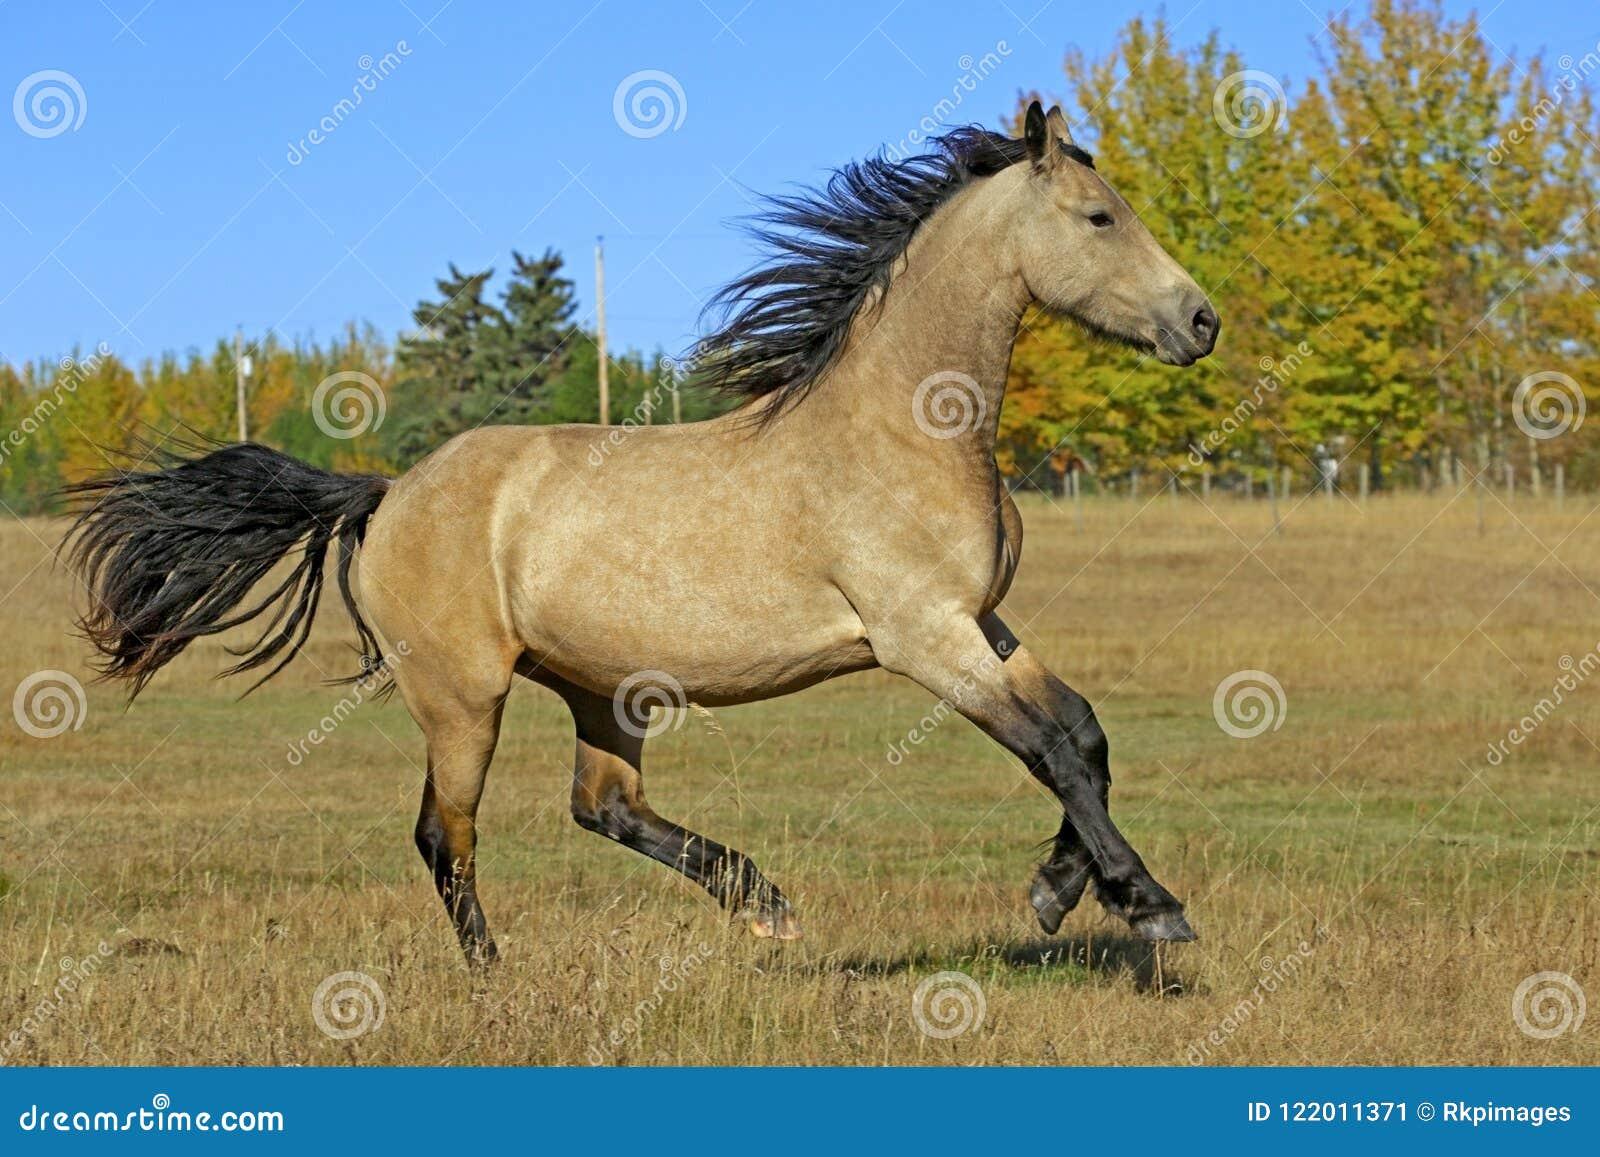 playful buckskin colt running at pasture stock image image of